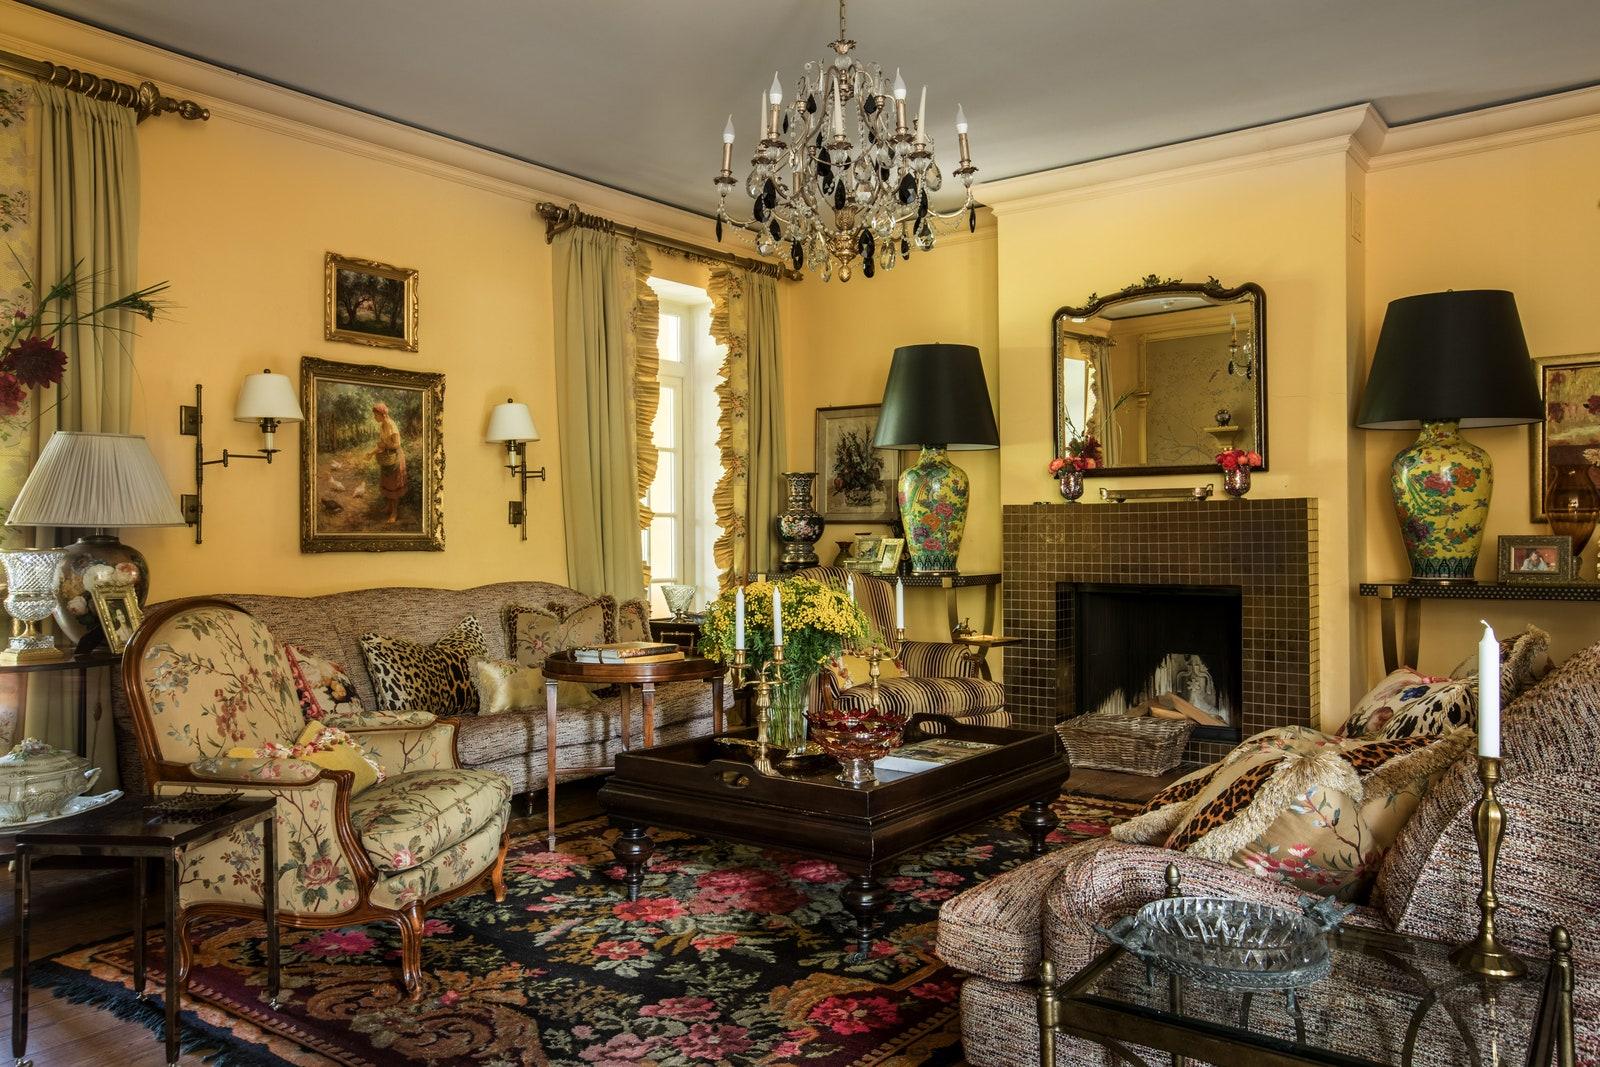 Ralph Lauren Home     Nobilis     Scalamandr Stark  Dolce amp Gabbana     Roche Bobois   Arredamento Lombardo      ...